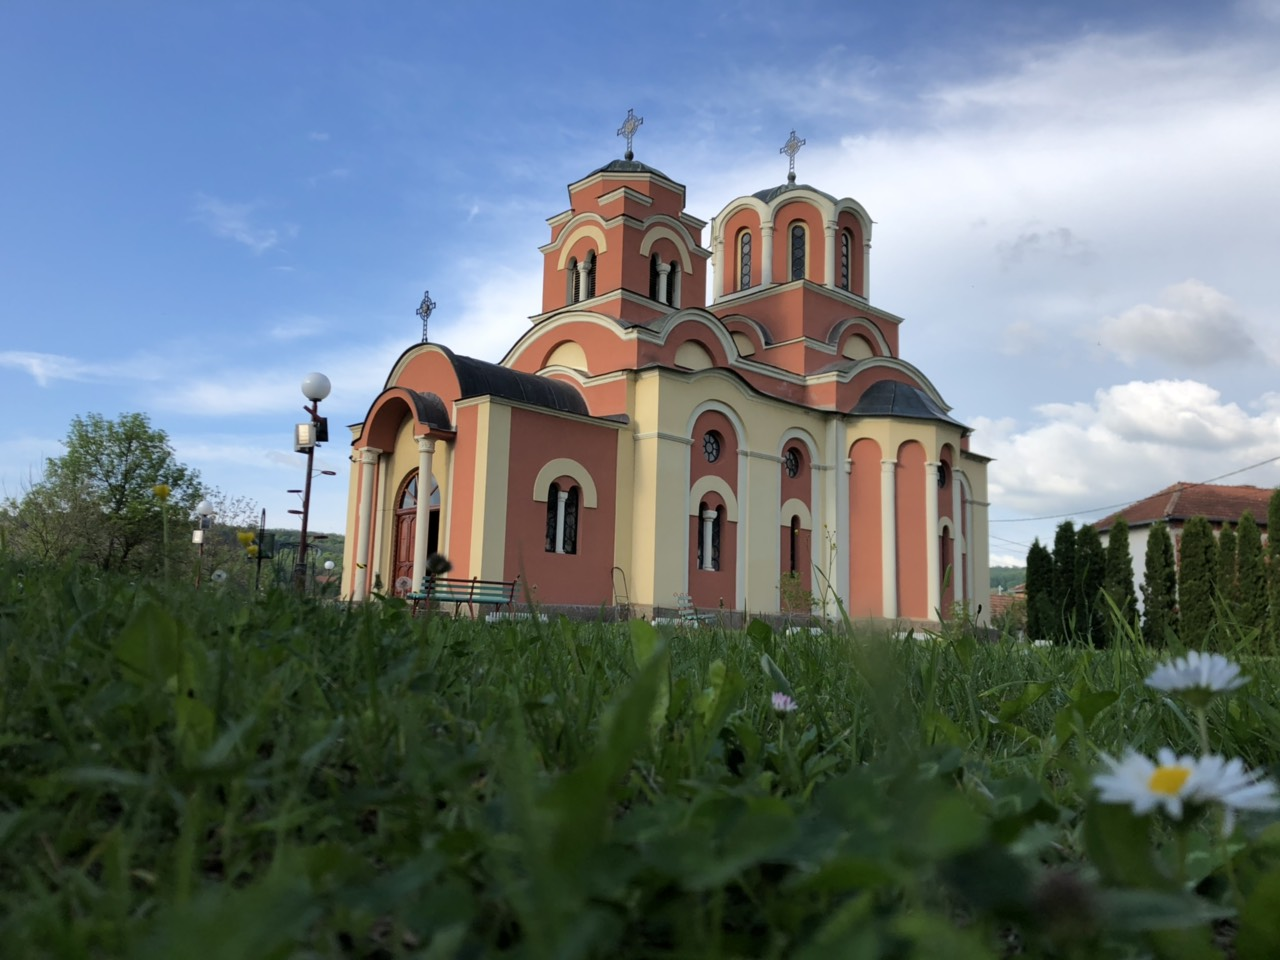 Crkva Svrljig, foto: M.M.